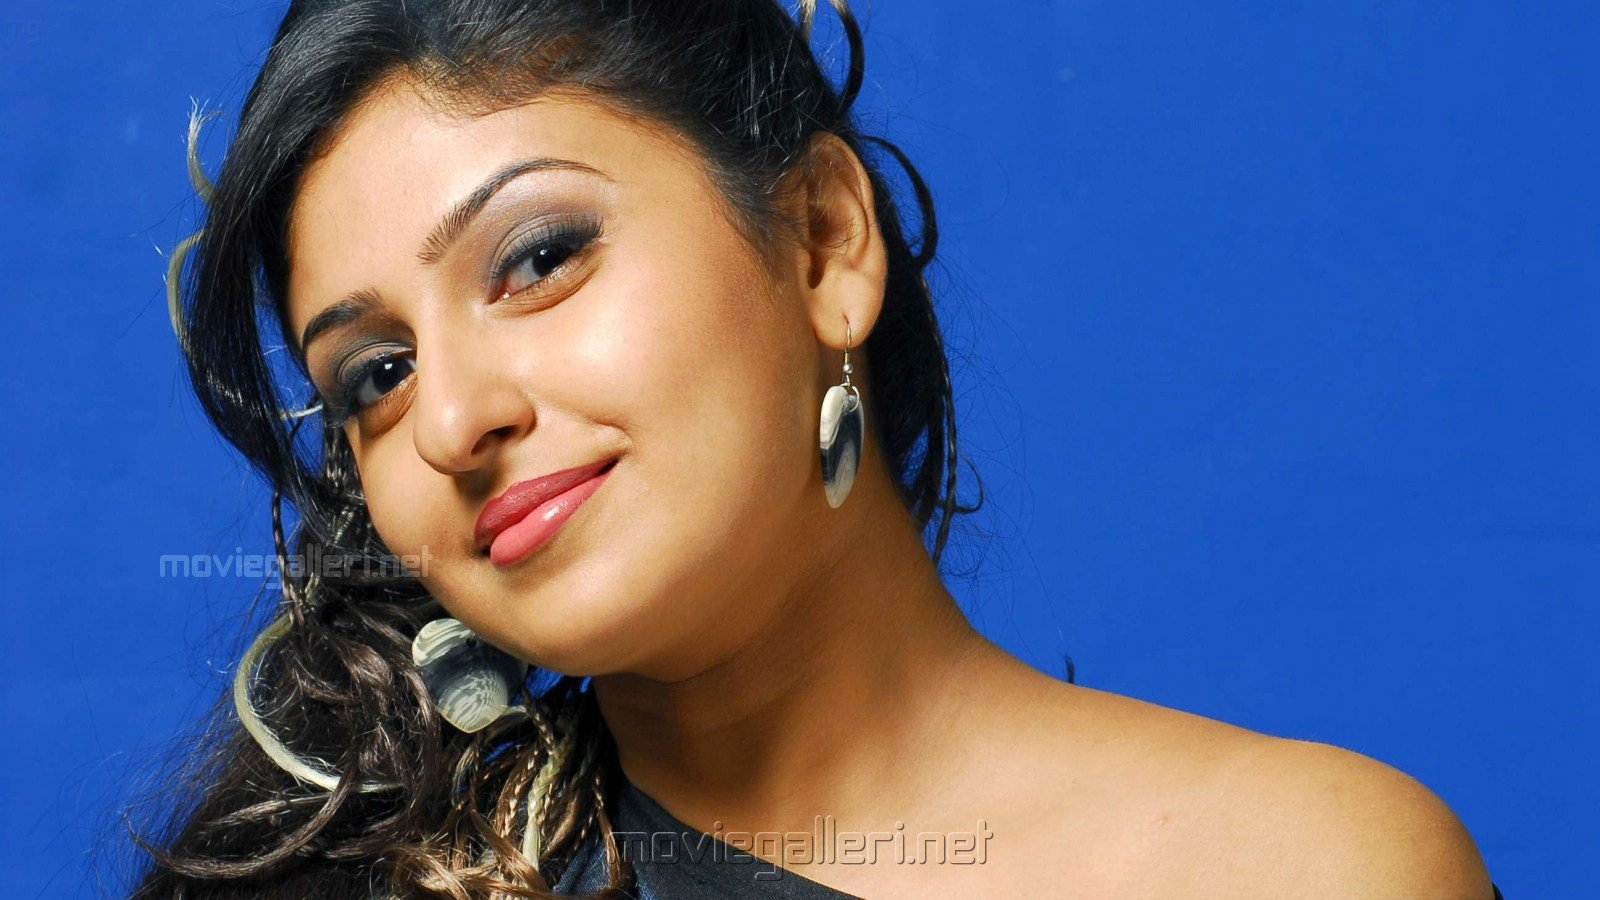 Tamil Actress HD Wallpapers - WallpaperSafari